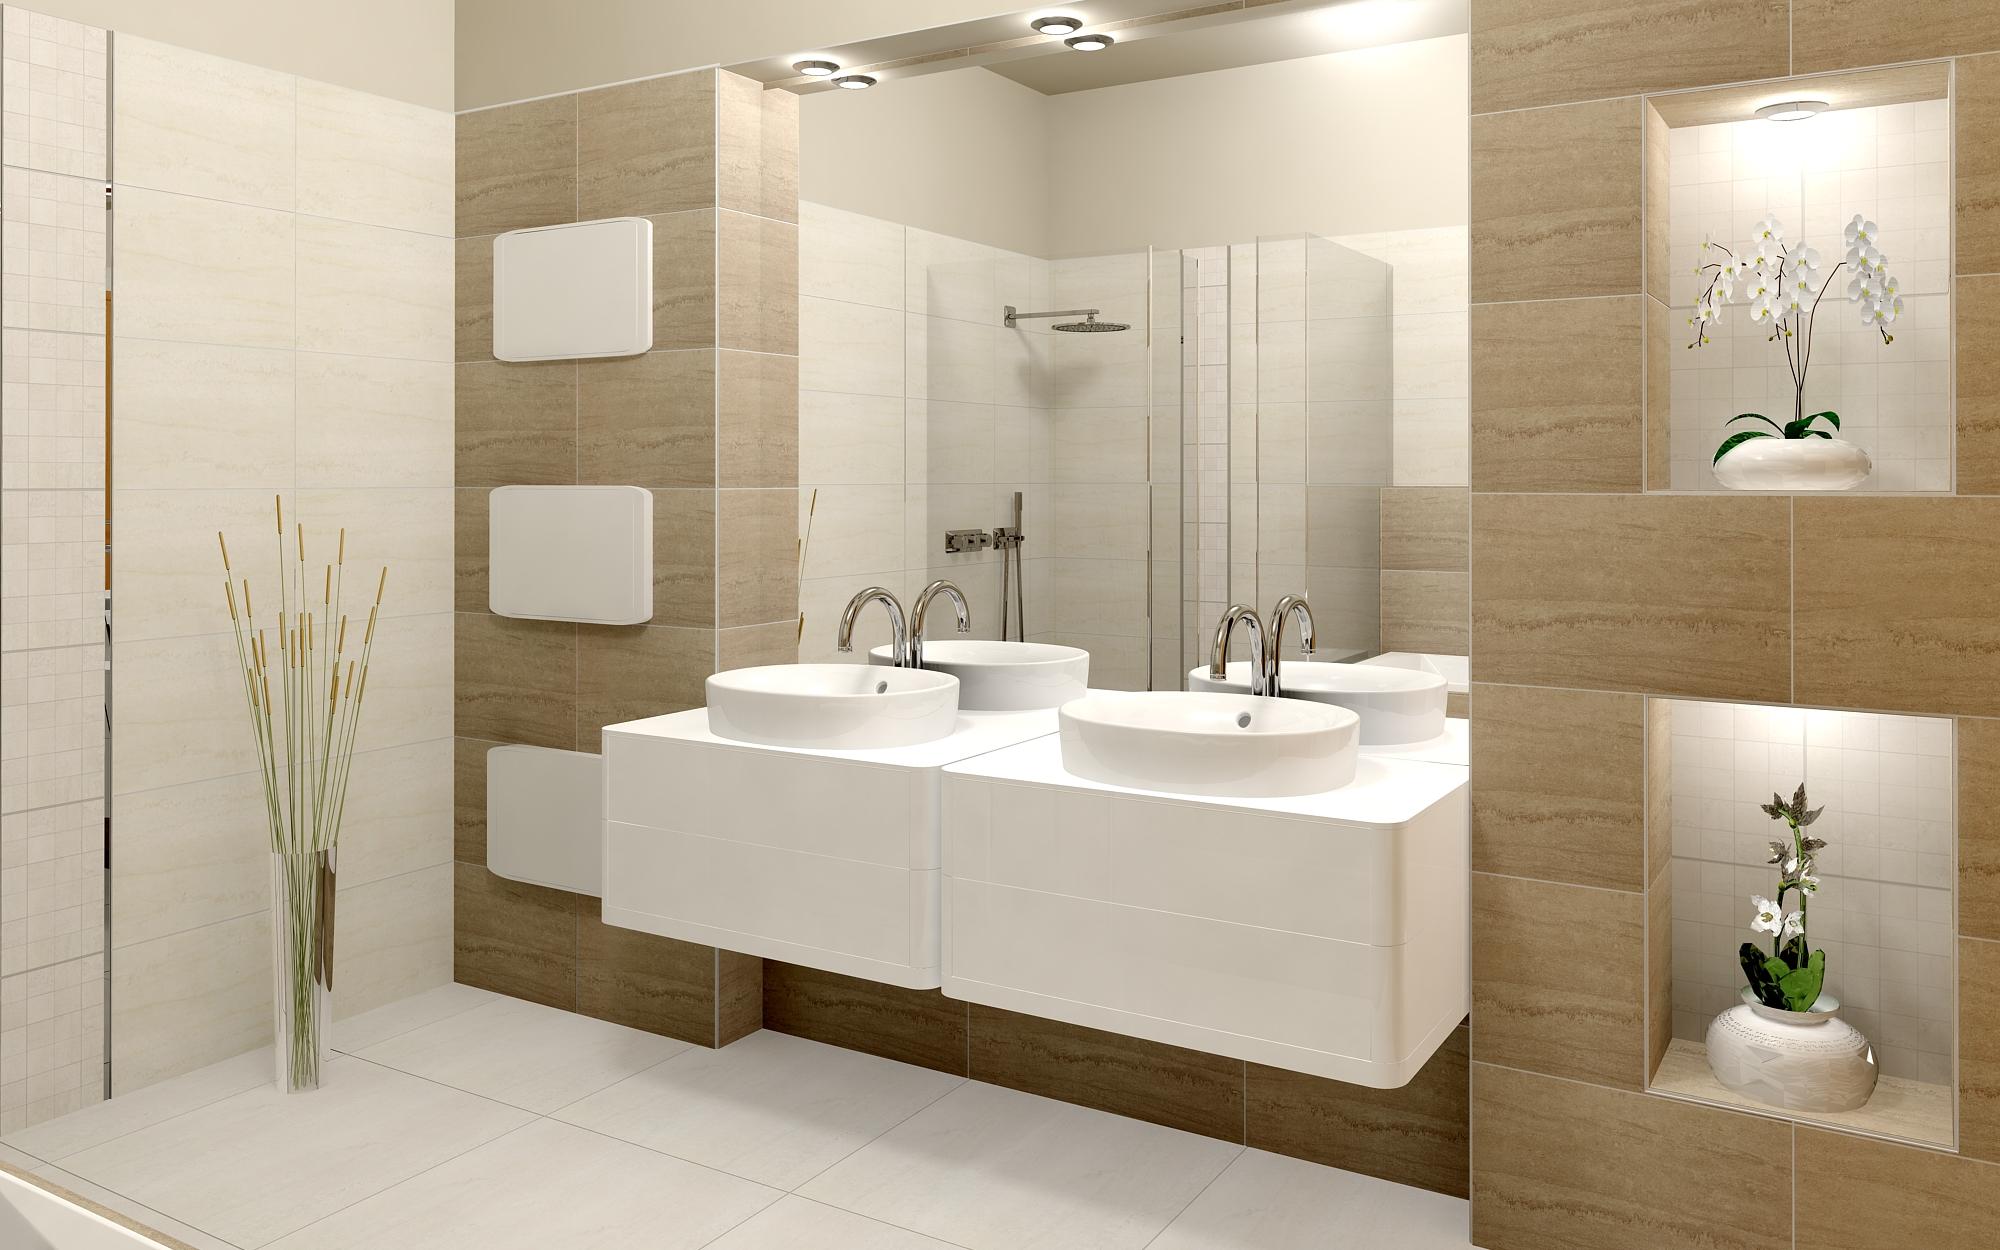 Kaleido Bathroom Von Szép Otthon Pápa() auf dem ViSoft360 Portal